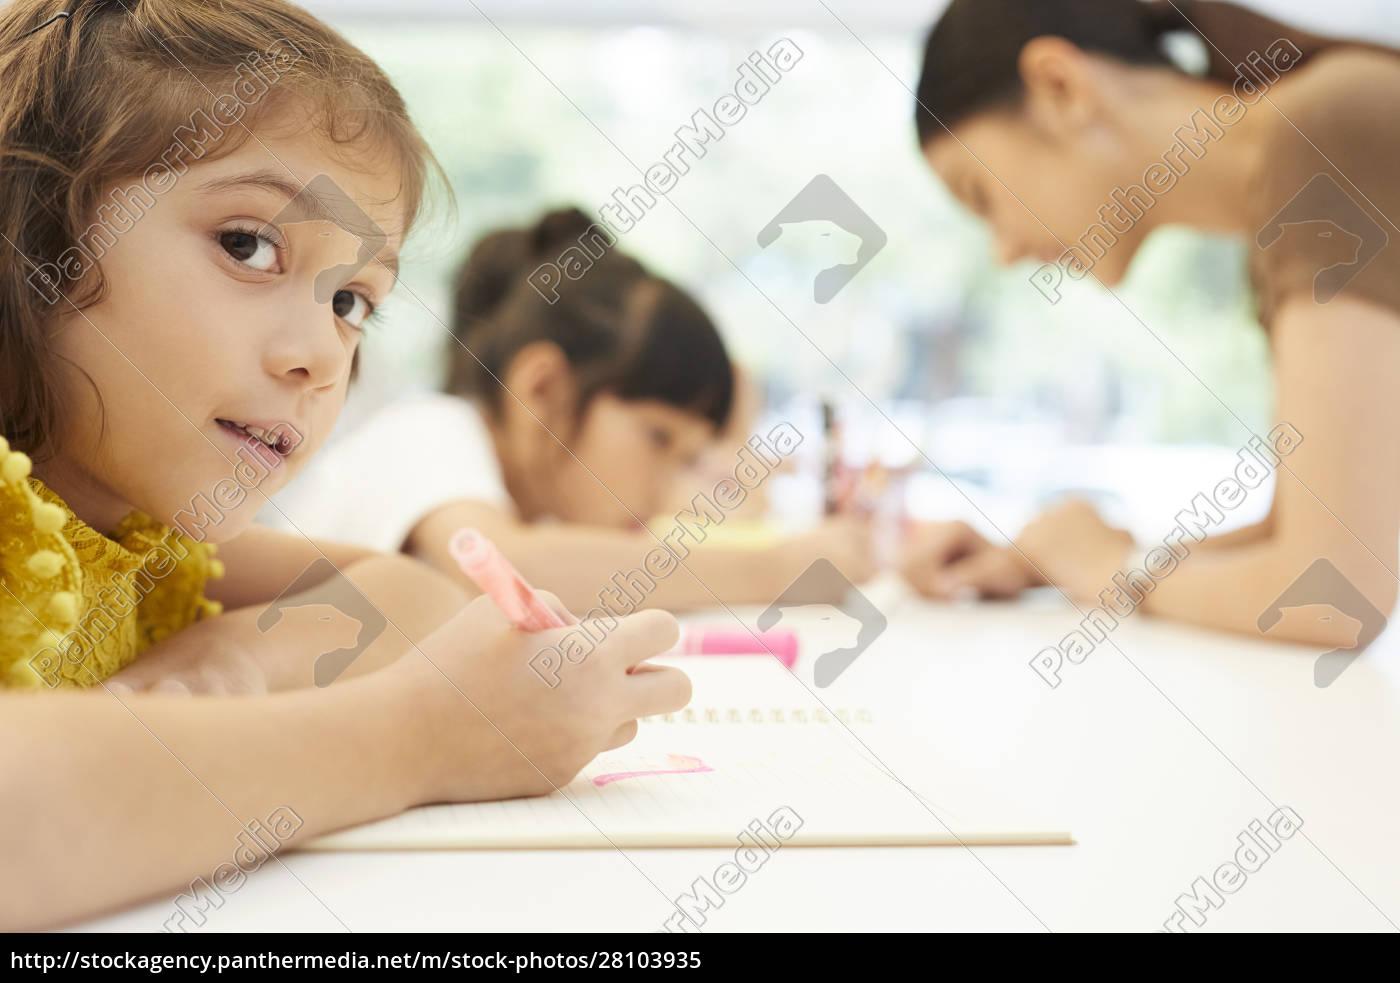 schoolchild, school, life - 28103935